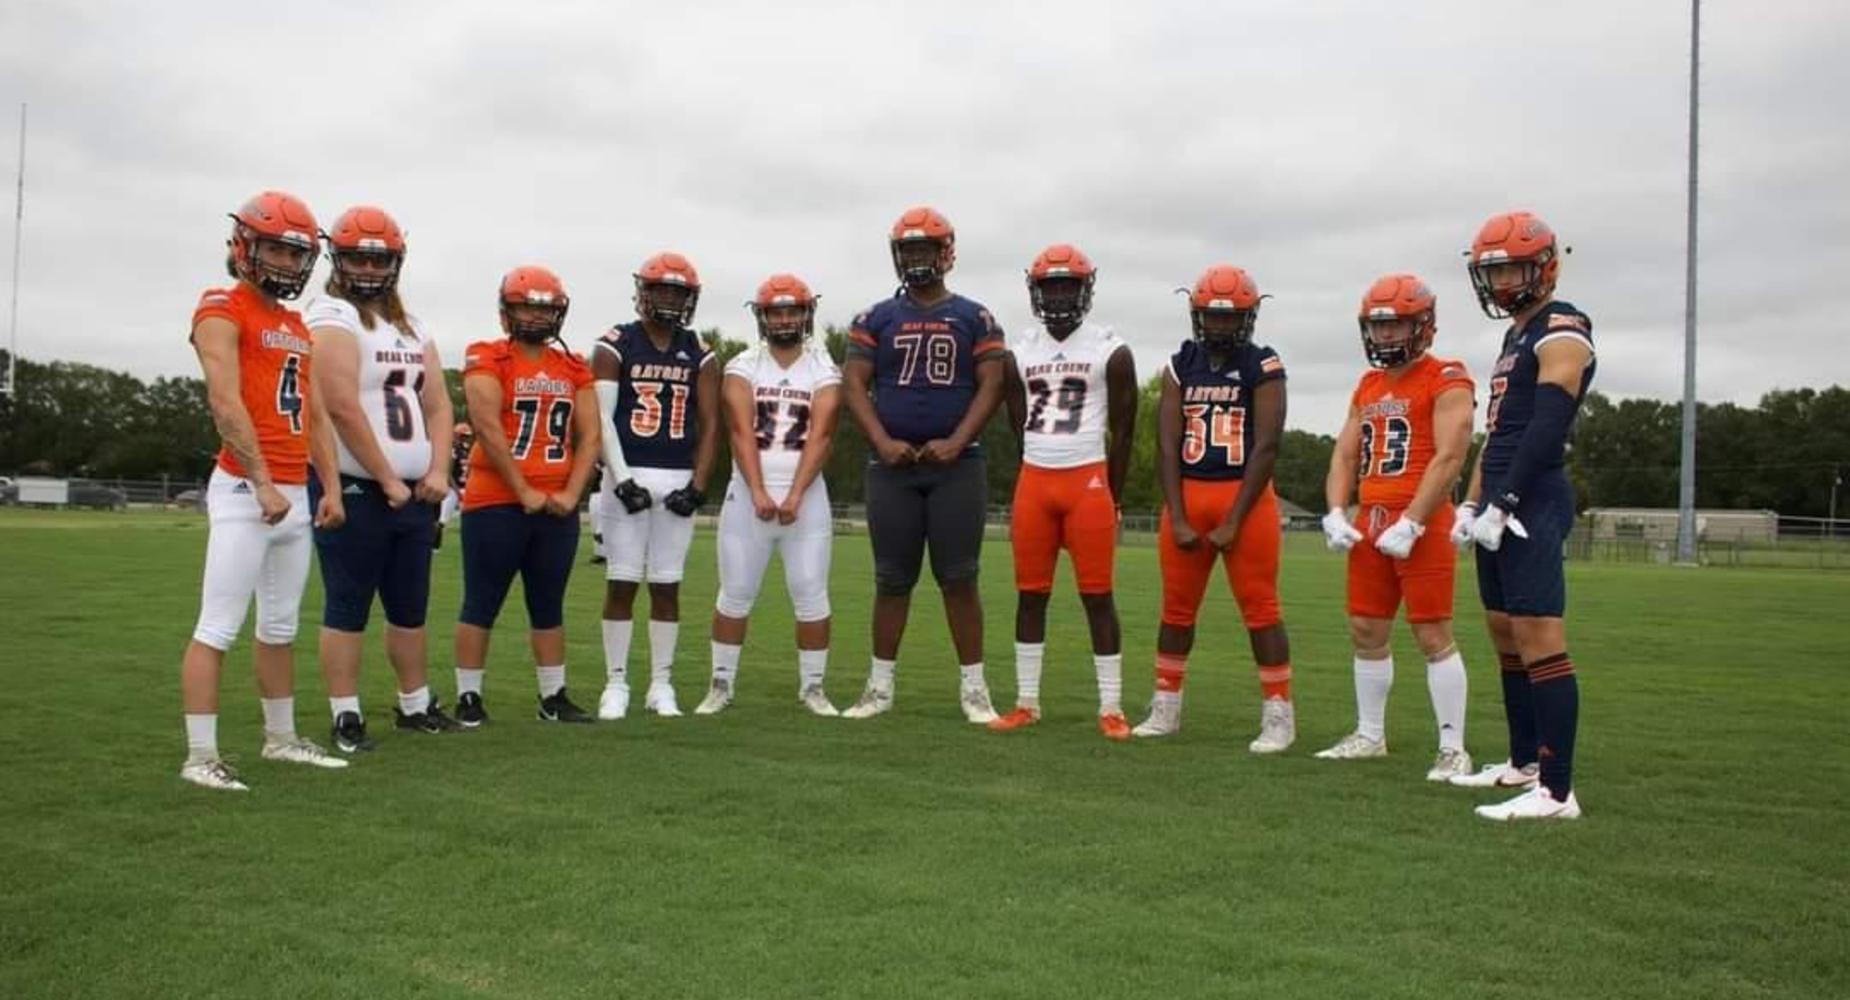 BCHS Football Team - 2020-2021